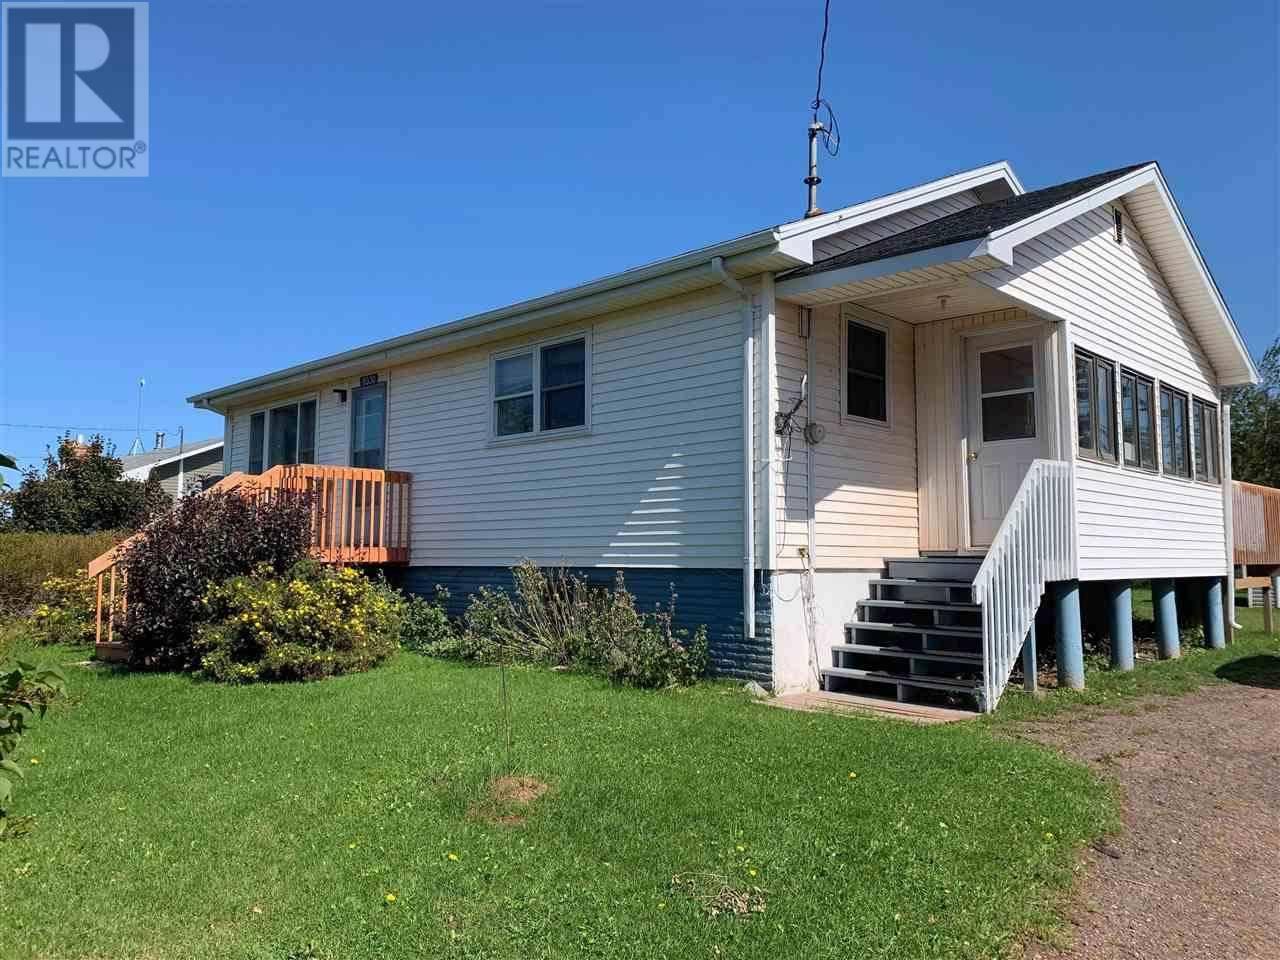 House for sale at  11330 Rte Miminegash Prince Edward Island - MLS: 201922983